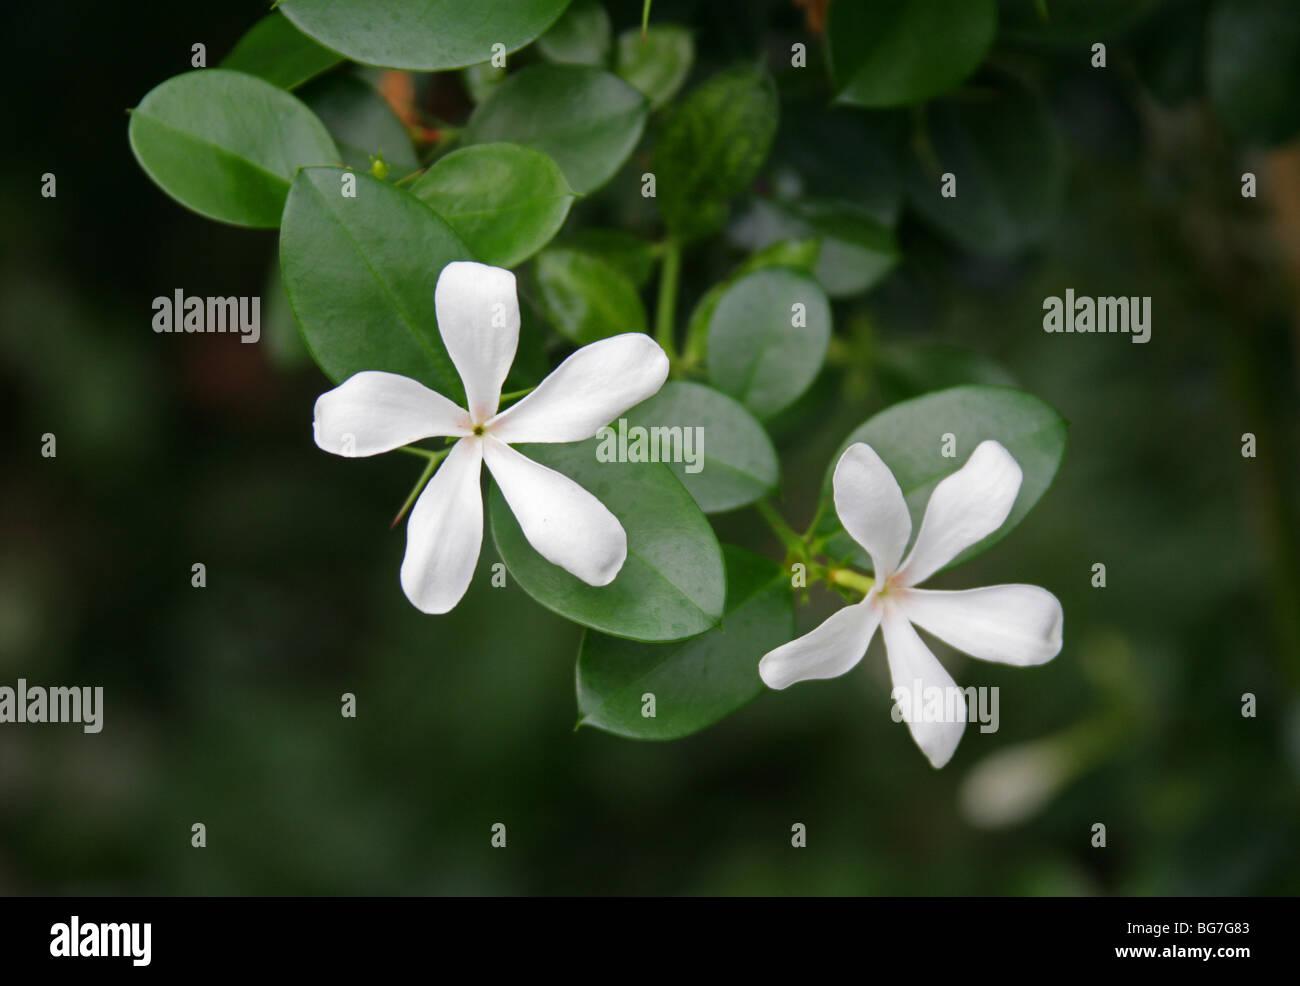 Flower of the Natal Plum or Large Num-Num, Carissa macrocarpa, Apocynaceae, South Africa. - Stock Image